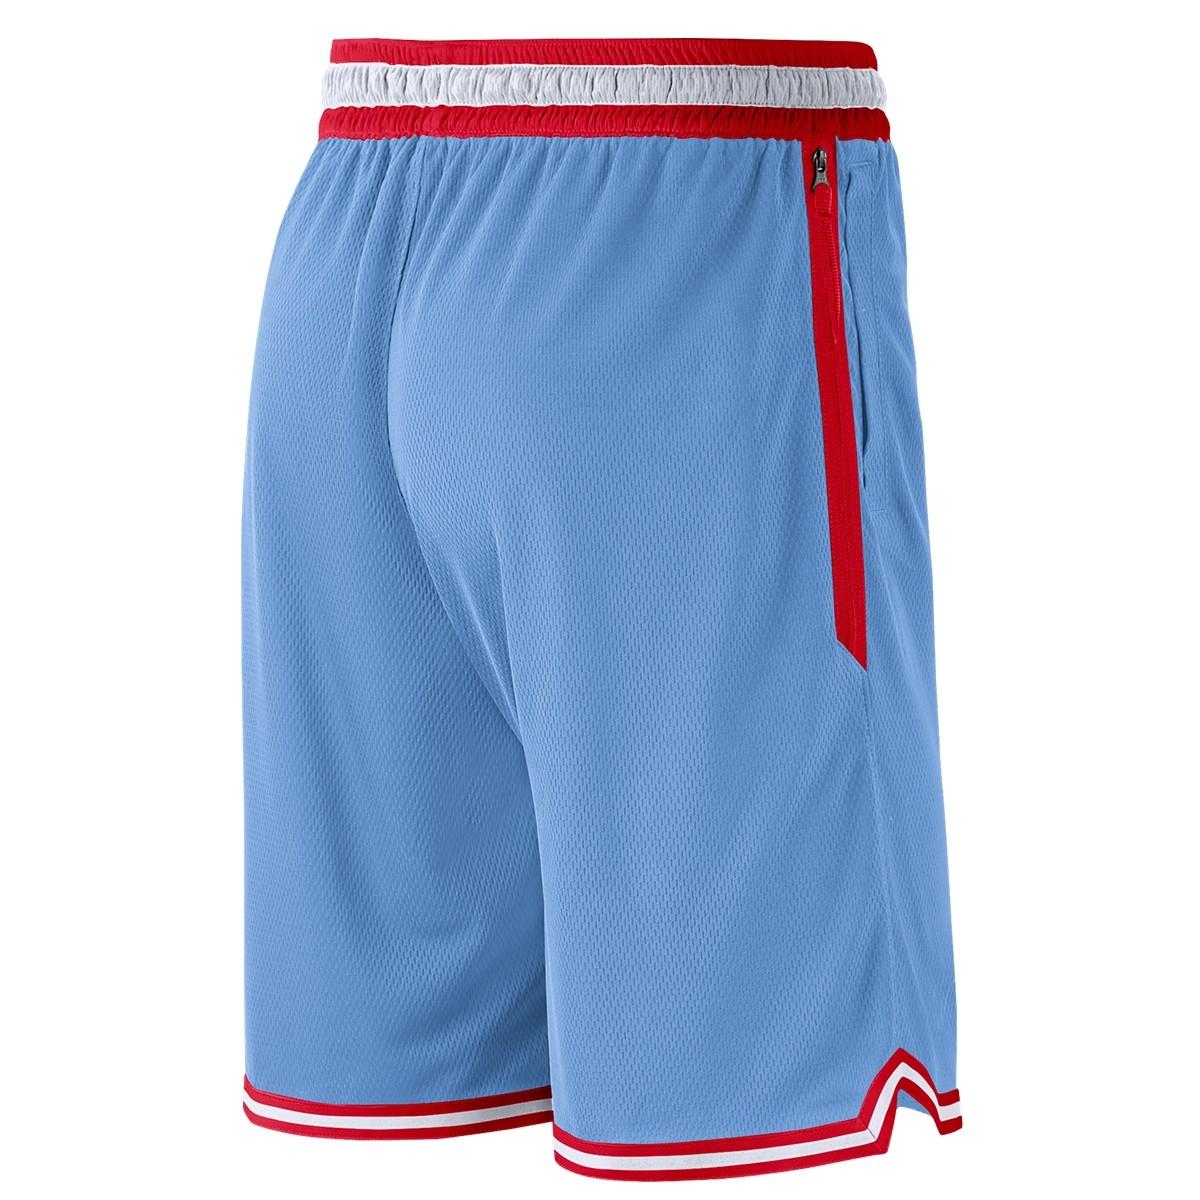 Nike NBA Short Team 31 DNA 'Blue'-CN9700-448